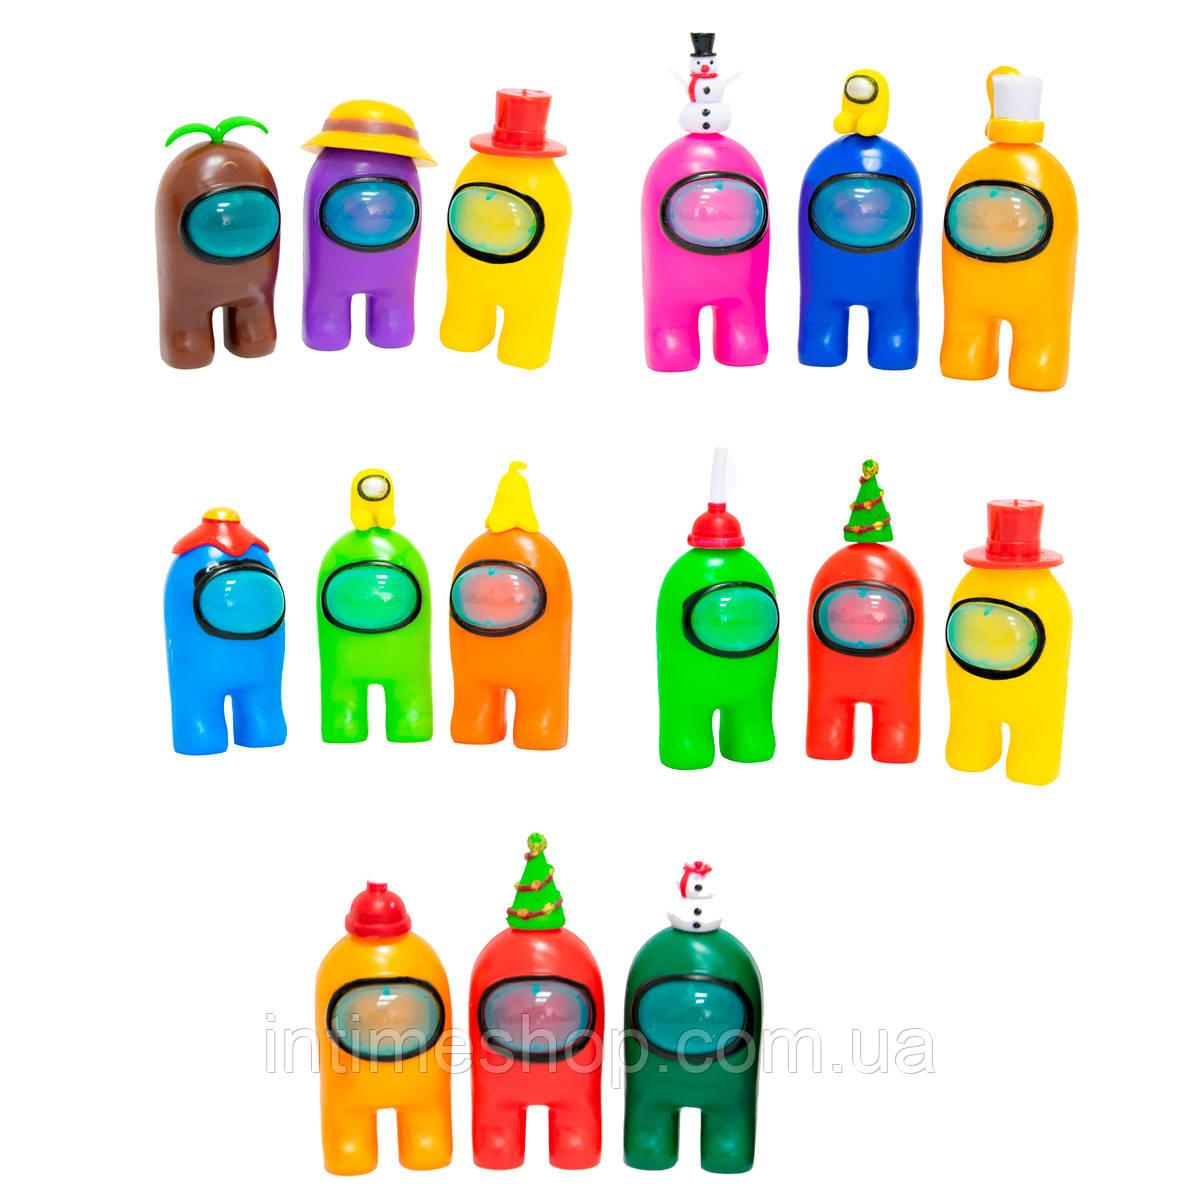 Набір з 3 іграшок з гри Аmong us - фігурки Амонг ас (серед нас), іграшки амонг ас (игрушки Амонг ас)